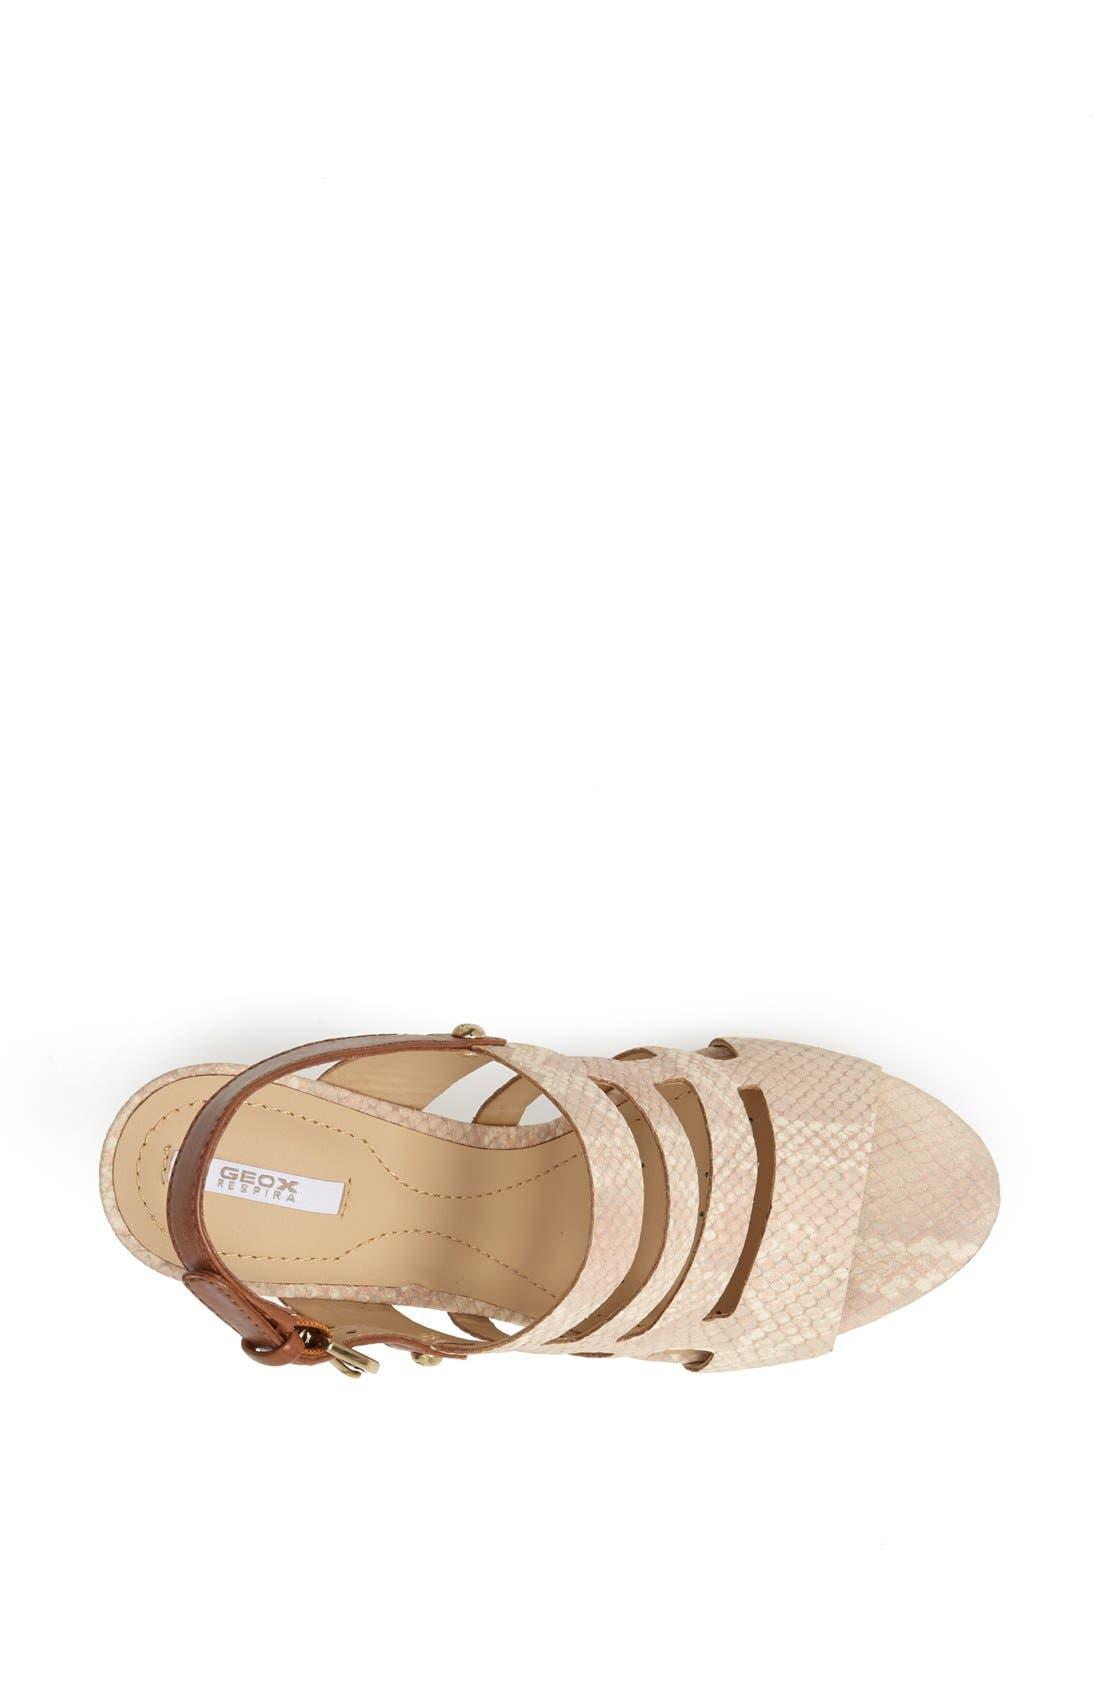 Alternate Image 3  - Geox 'Sibilla' Wedge Sandal